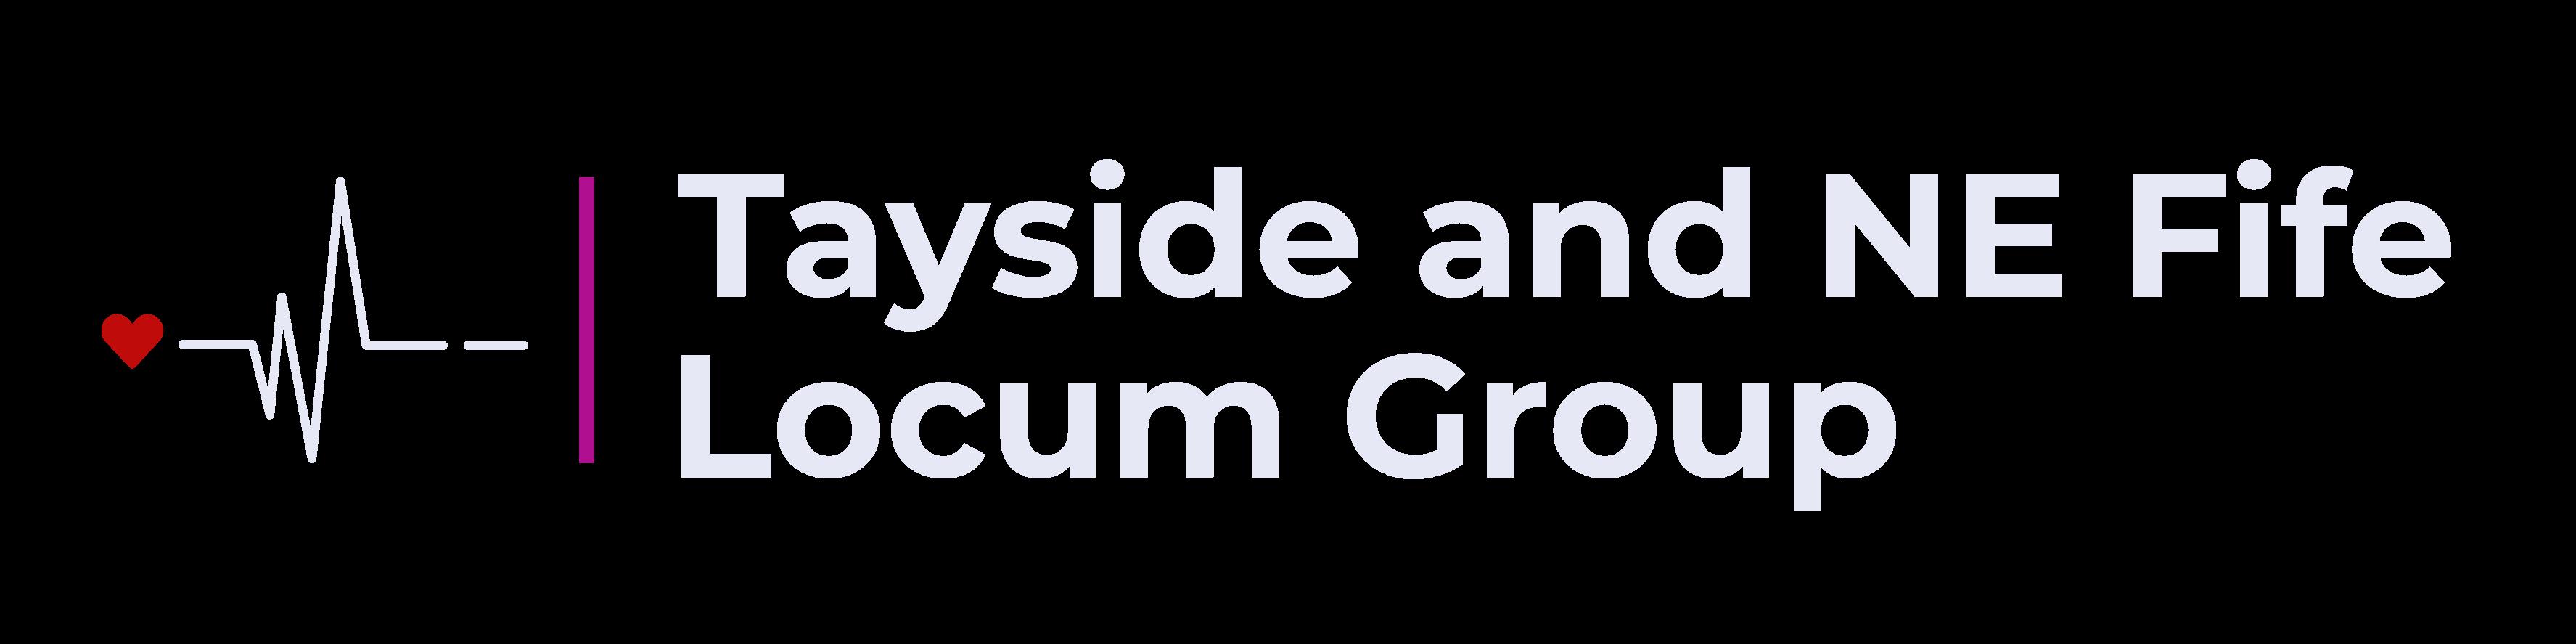 Tayside and NE Fife Locum Group